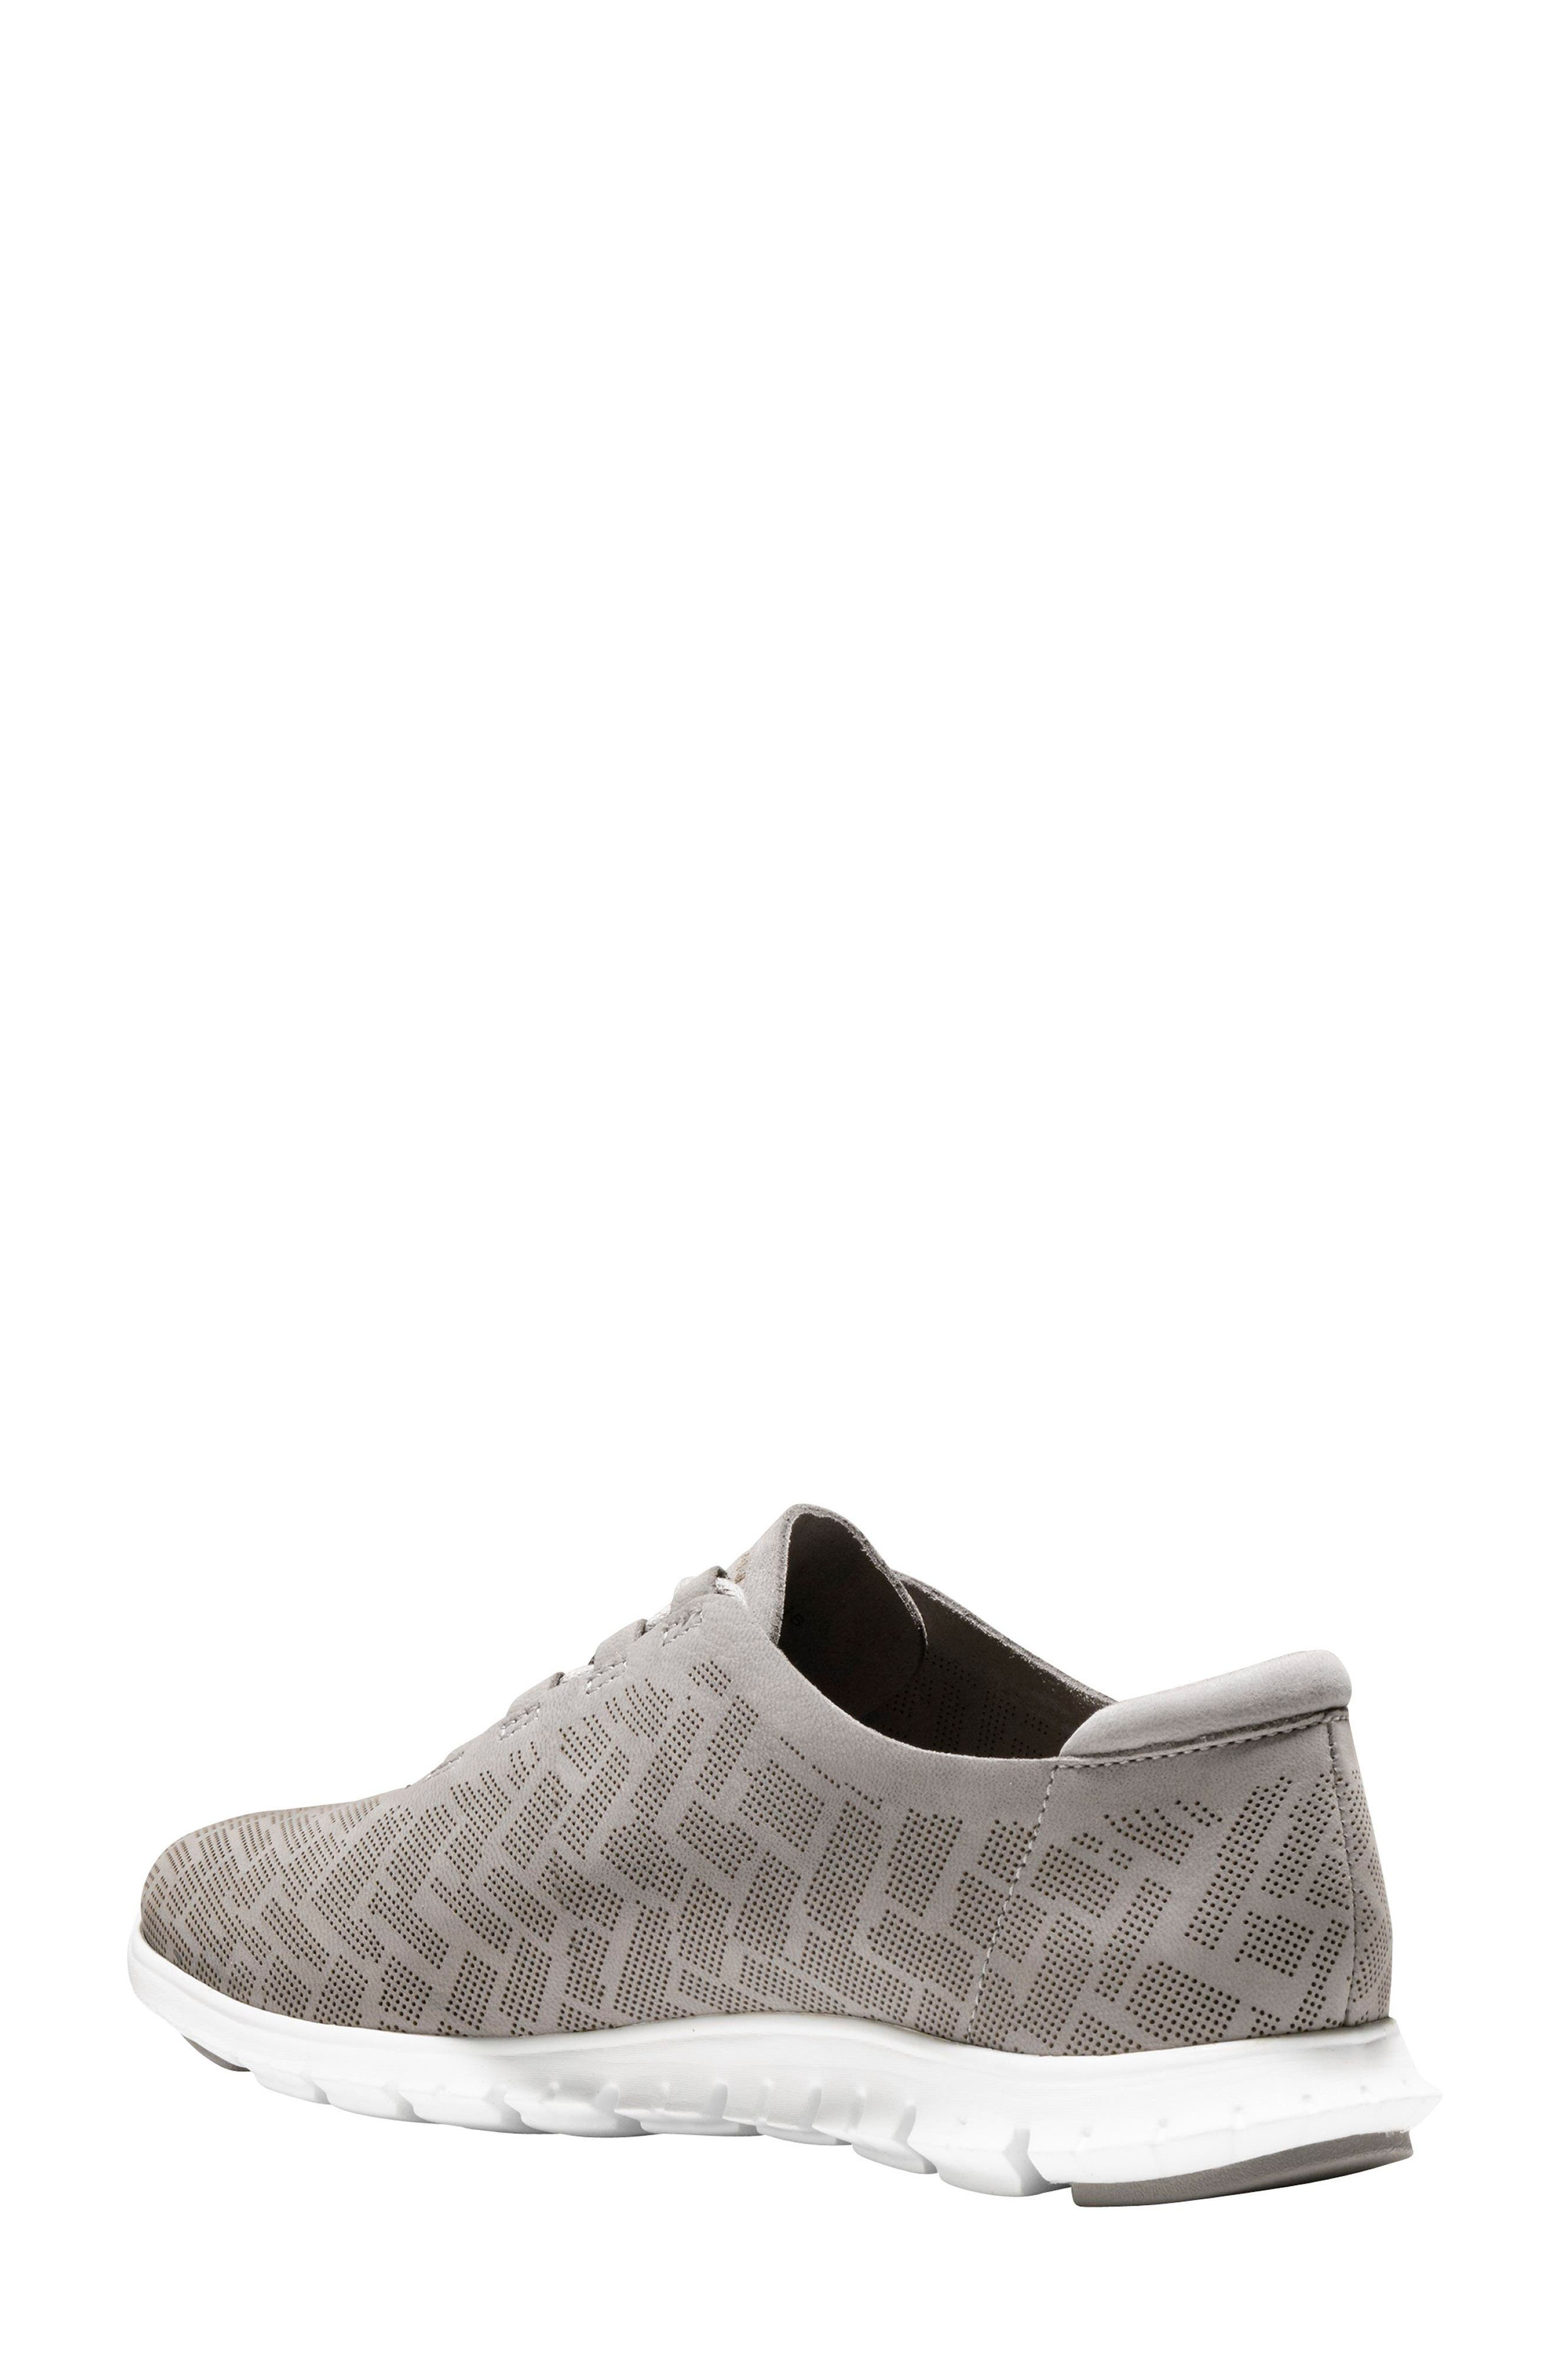 ZERØGRAND Genevieve Perforated Sneaker,                             Alternate thumbnail 2, color,                             Ironstone Perf Nubuck